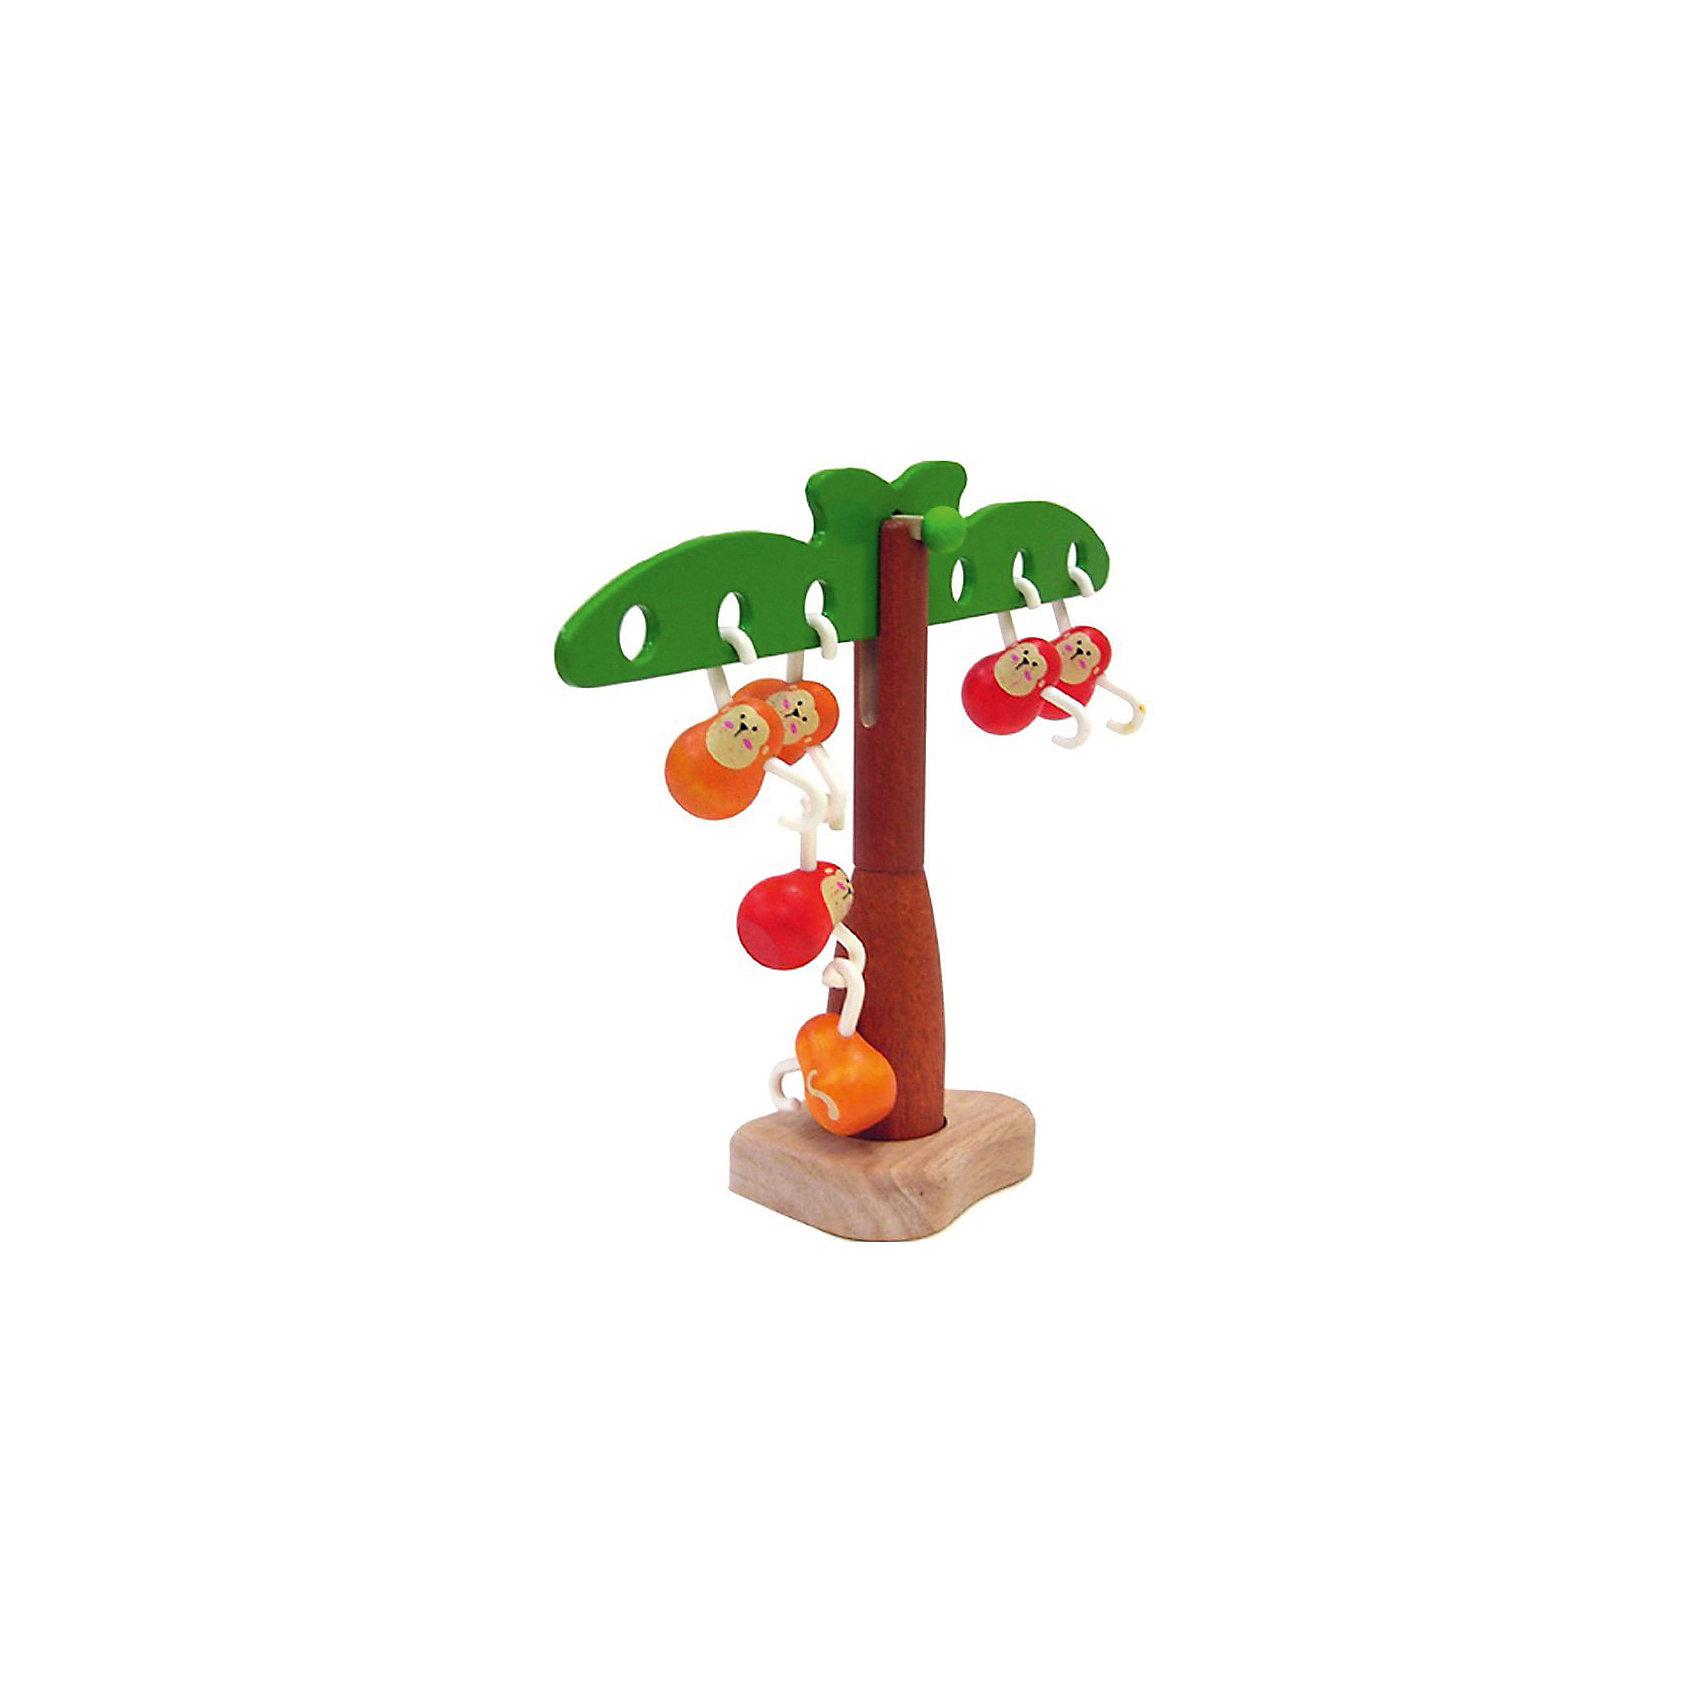 Plan Toys PLAN TOYS 5349 Игра Балансирующие обезьянки dkny stanhope ny2401